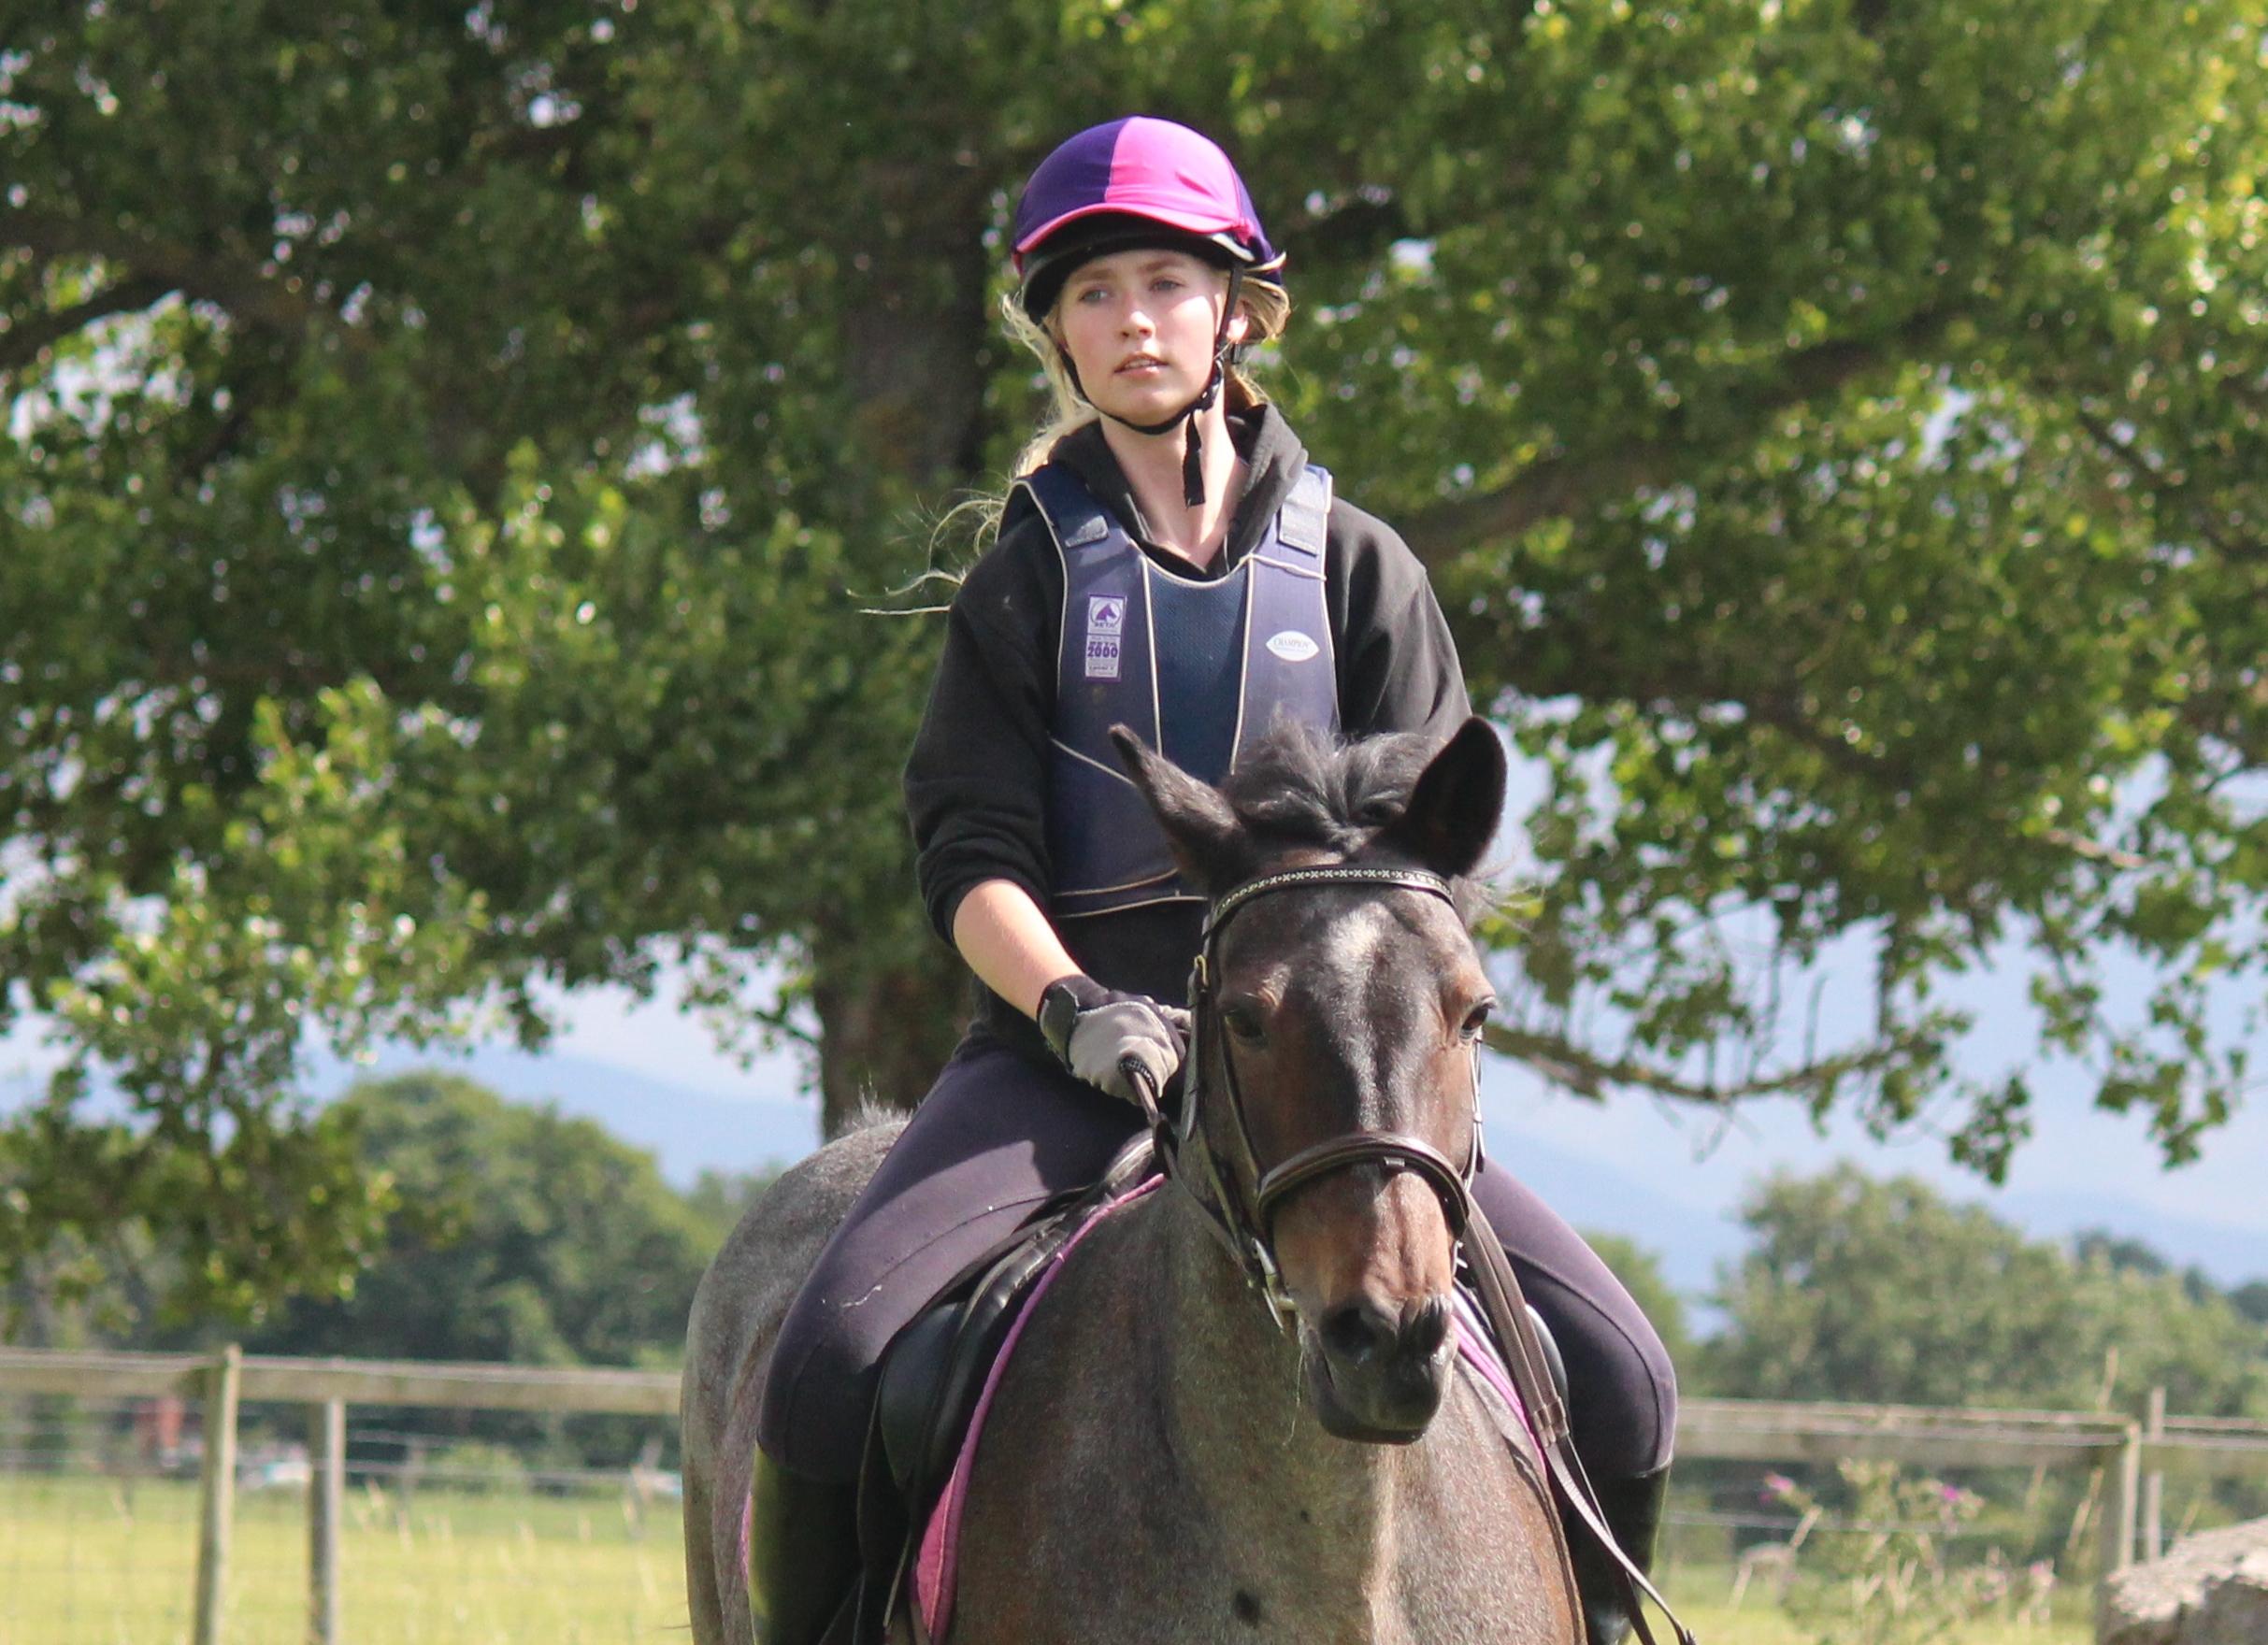 Llannerch Pony Camp